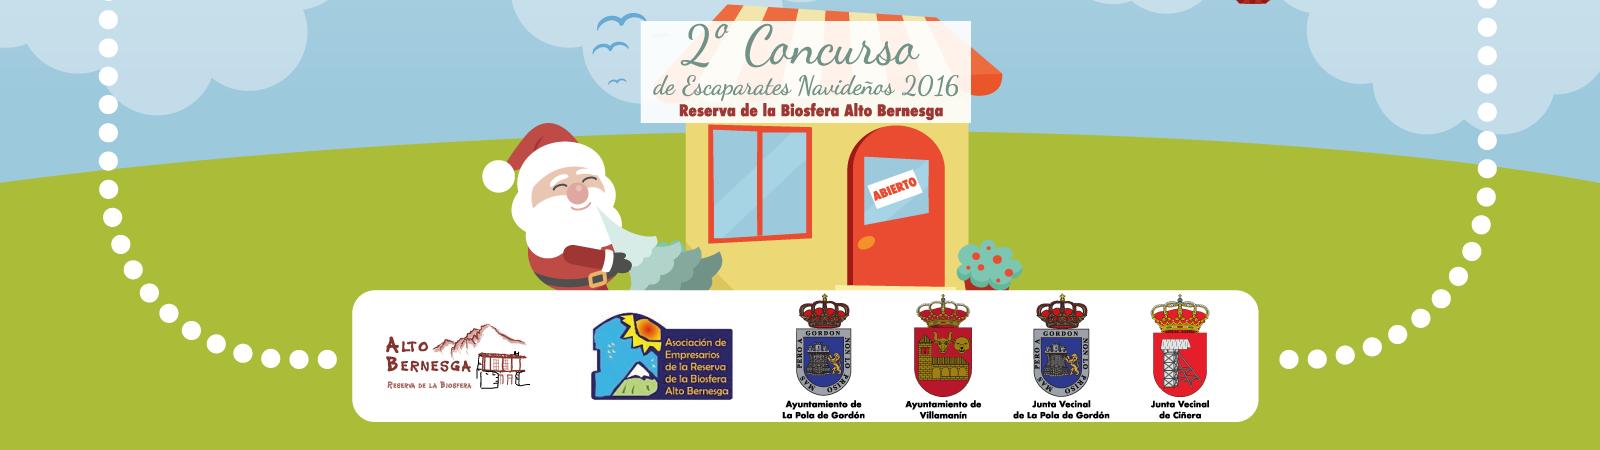 cabecera_concurso_navideno